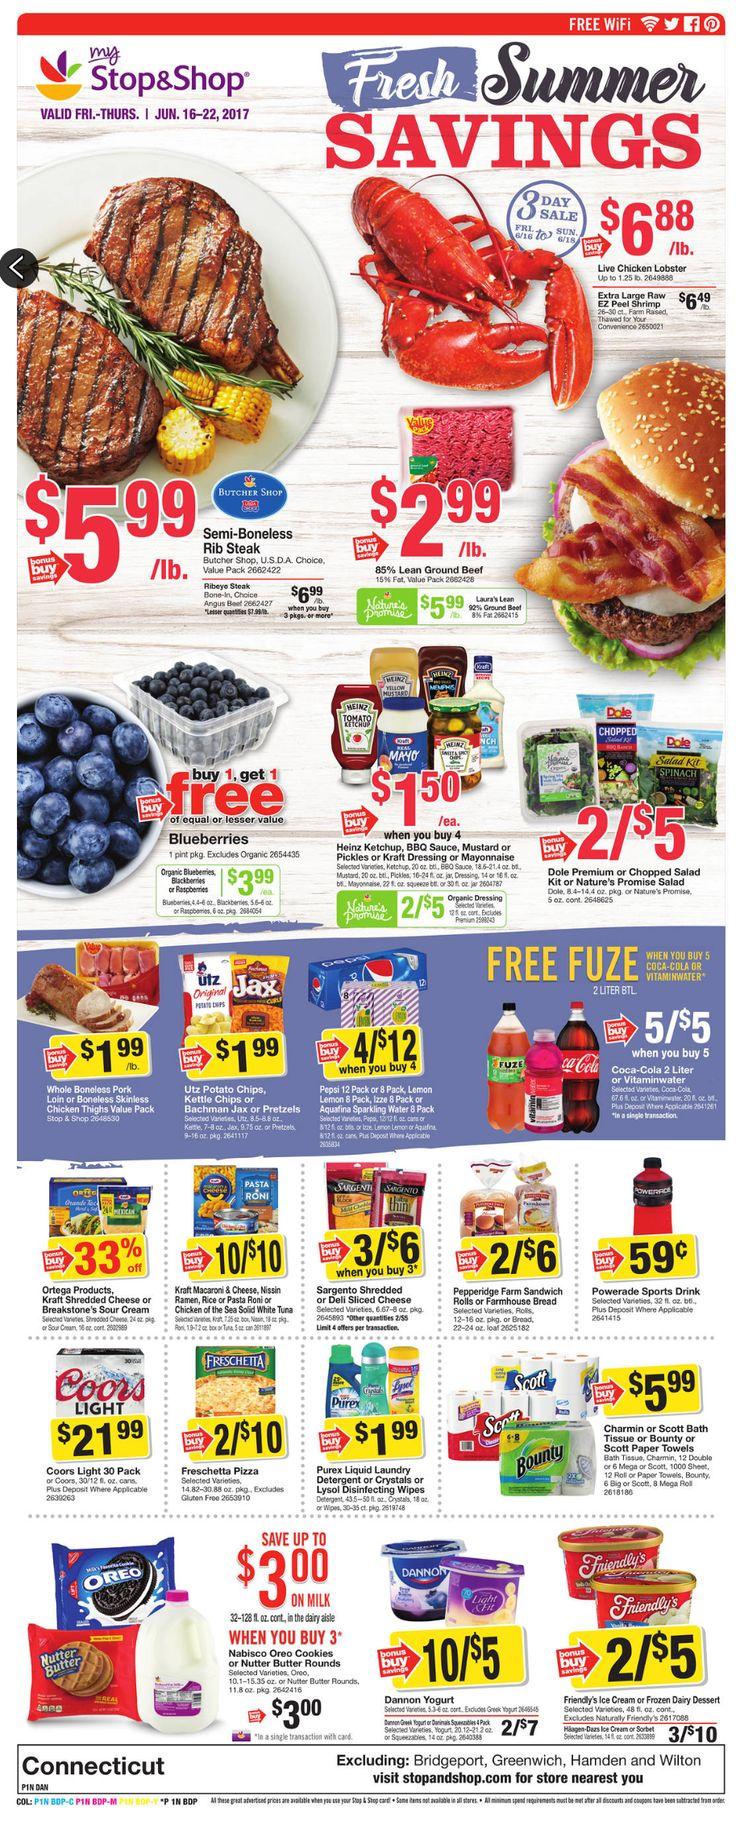 Stop and Shop Circular June 16 - 22, 2017 - http://www.olcatalog.com/grocery/stop-and-shop-circular.html